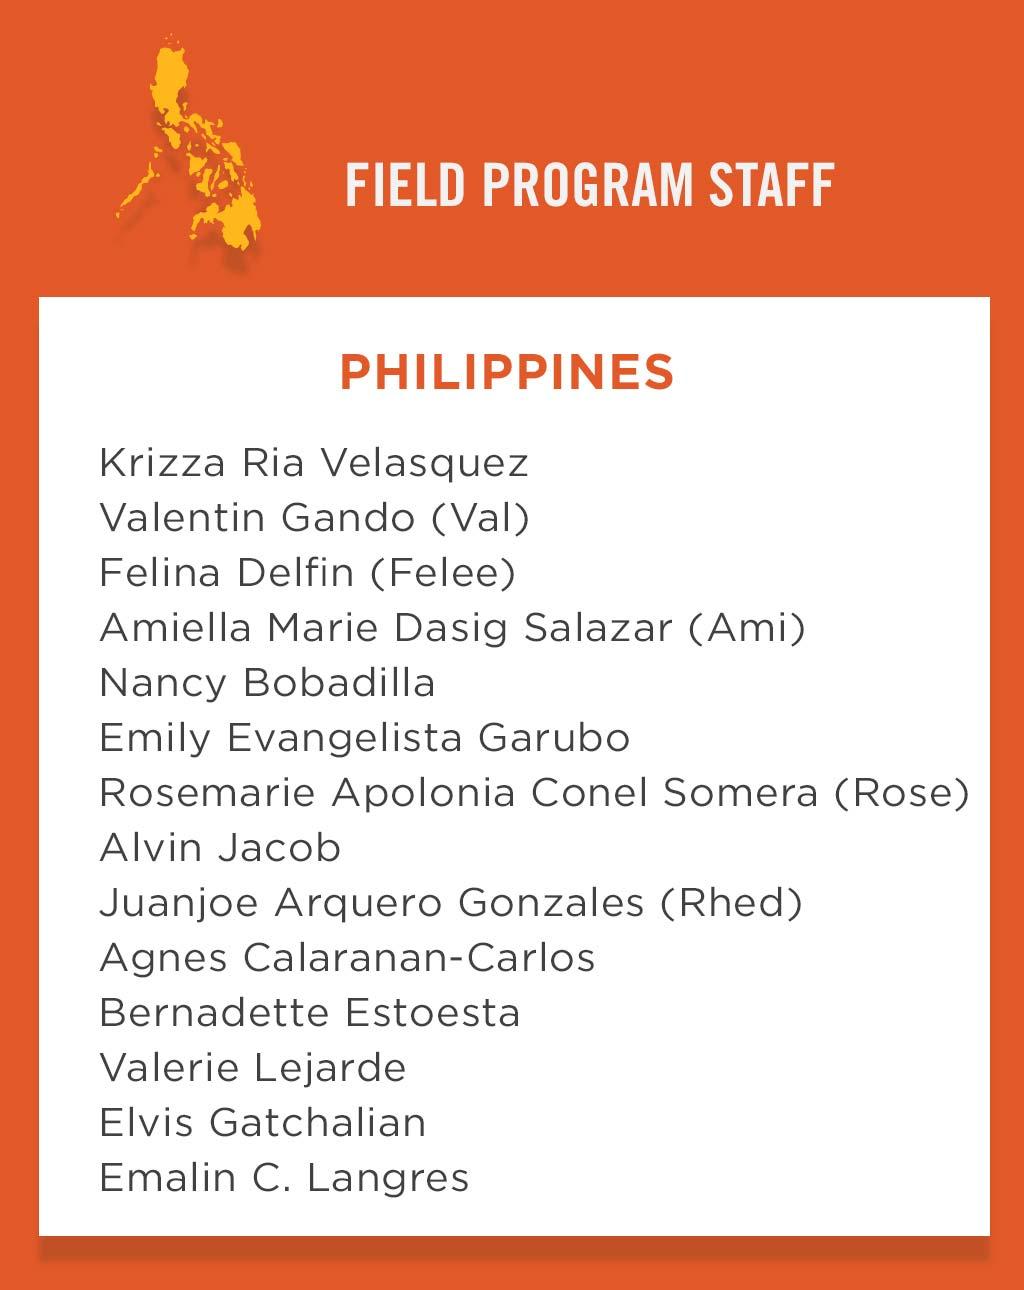 Philippines Field Program Staff